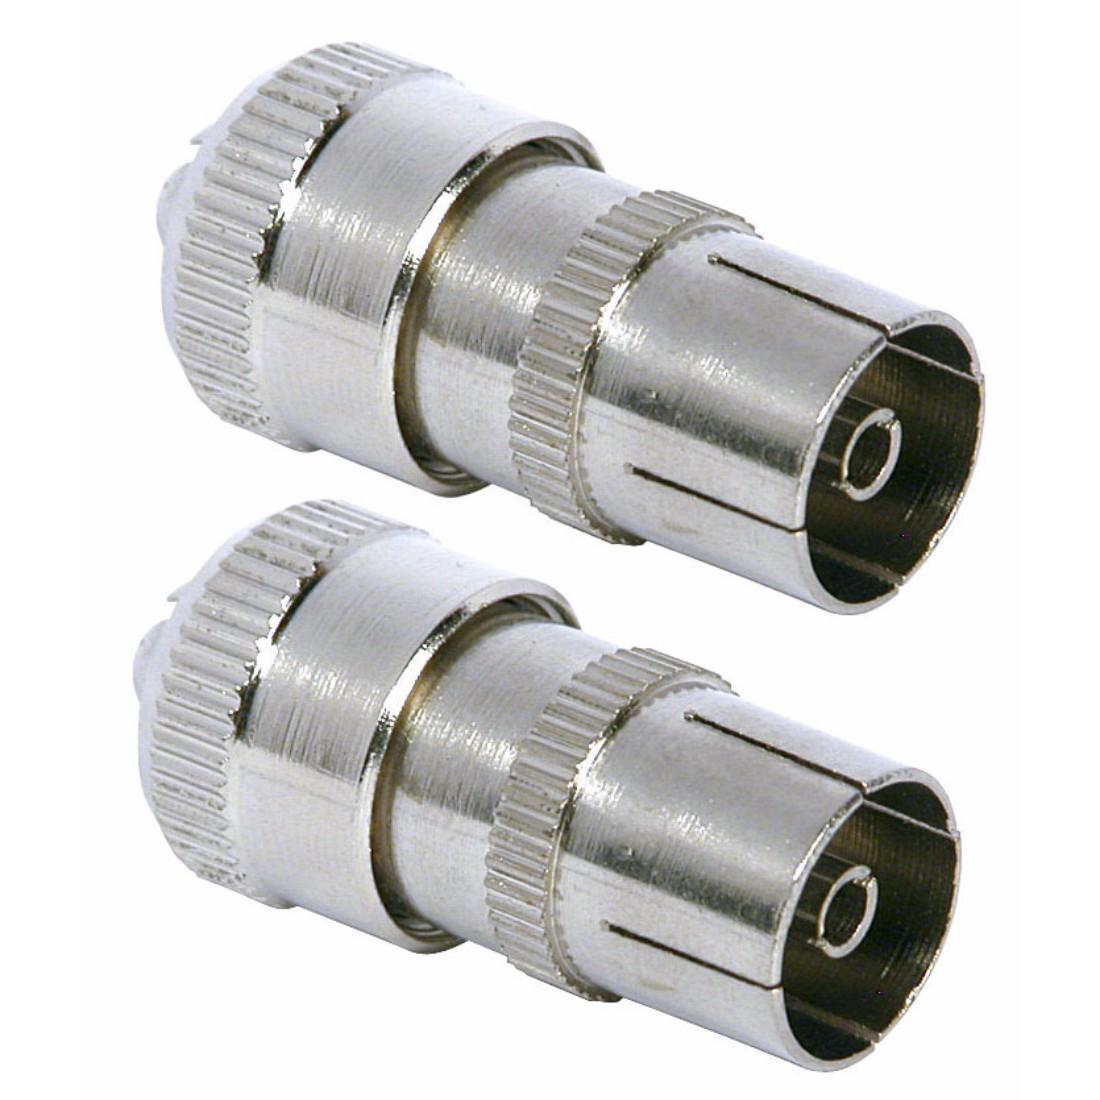 20pcs Green FKM Rubber Airtight O-Ring Sealing ring Line diameter:1.5mm)